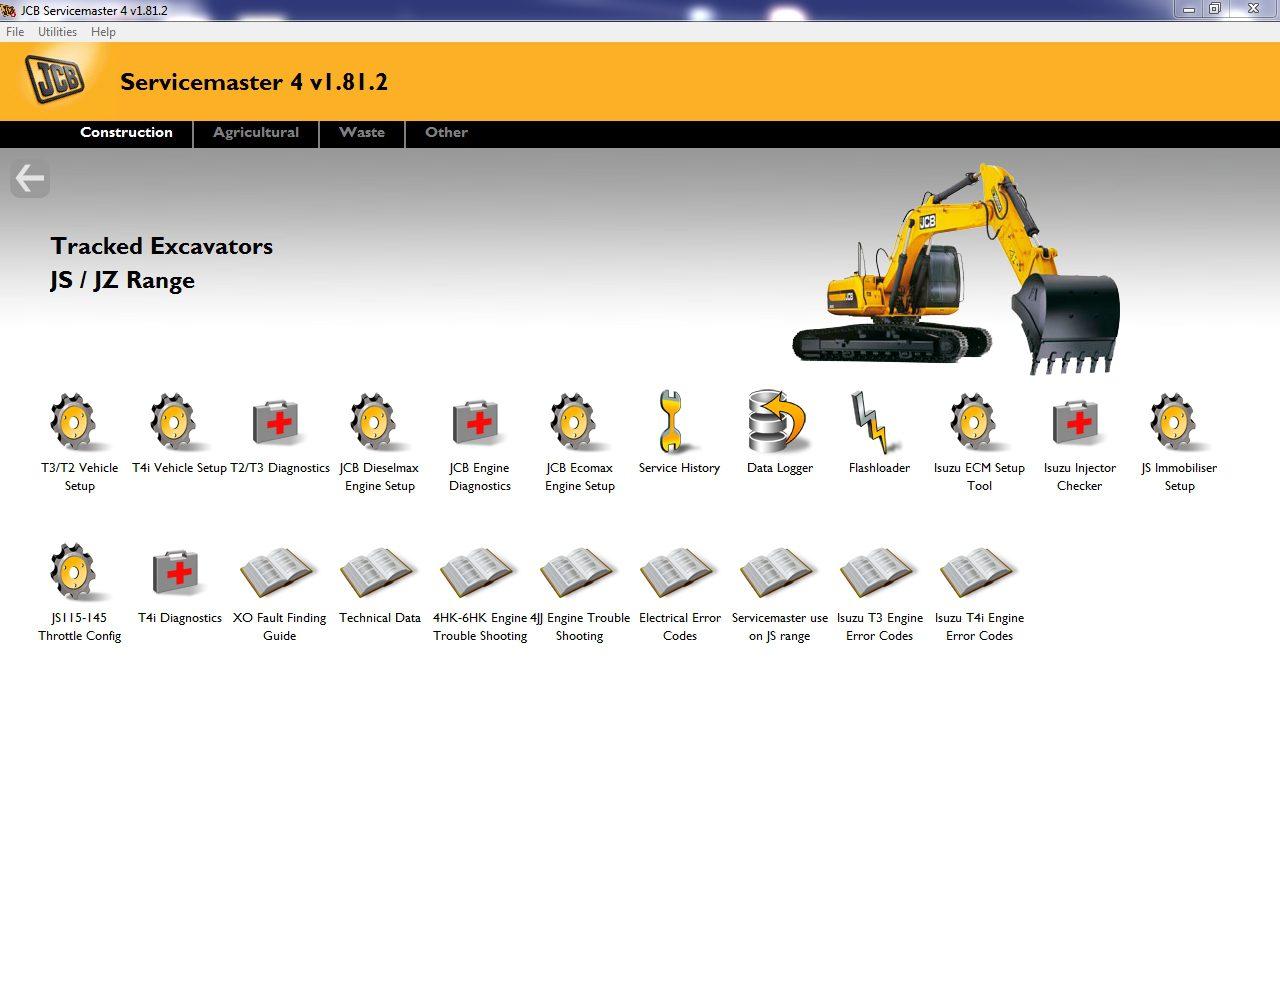 JCB_ServiceMaster_4_v1812_05201906